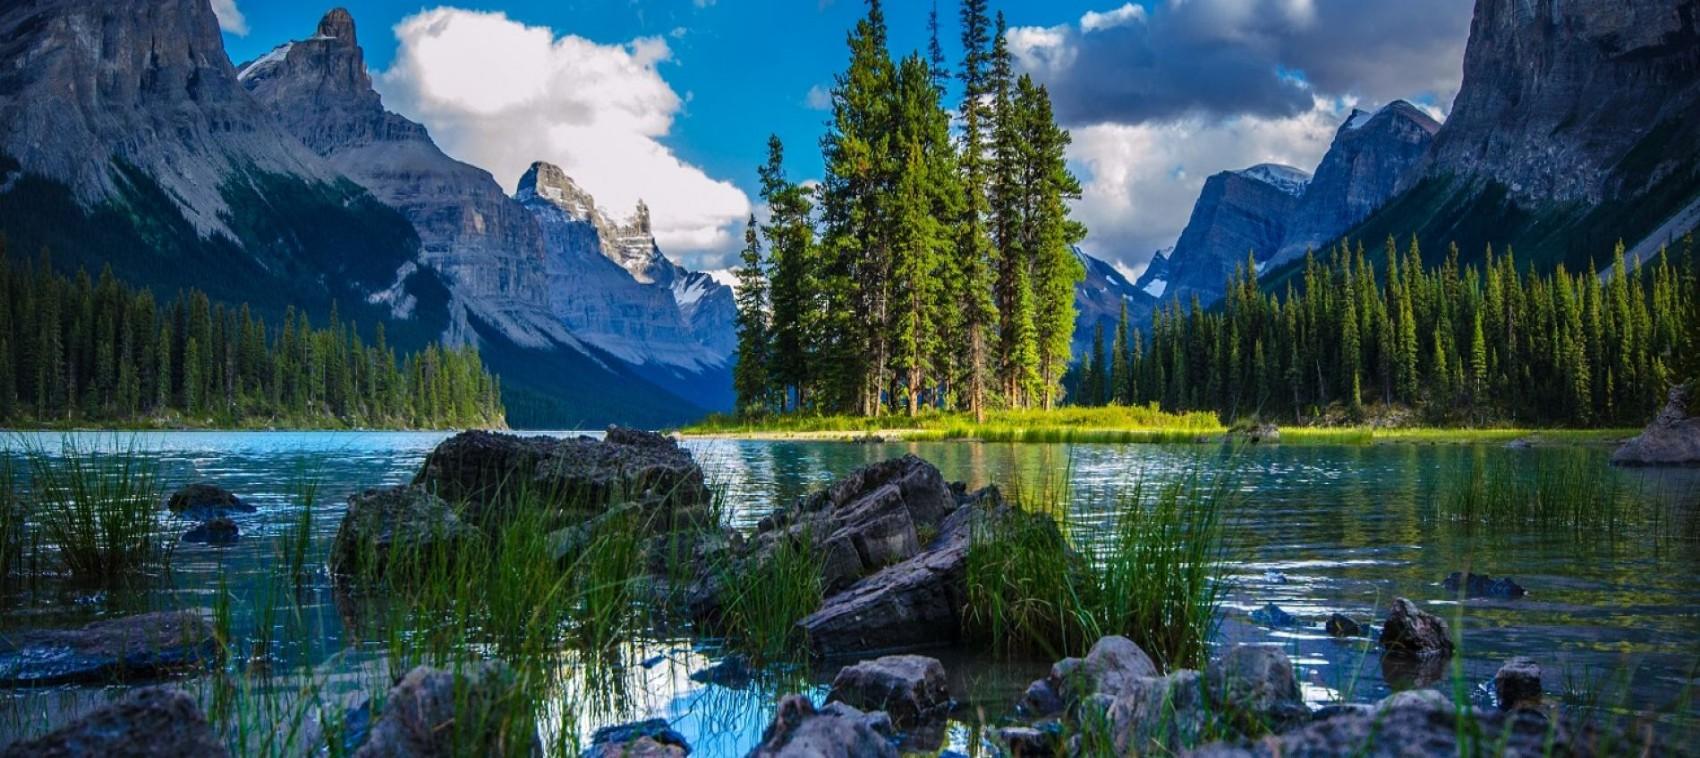 Canadian Rockies Challenge 2020